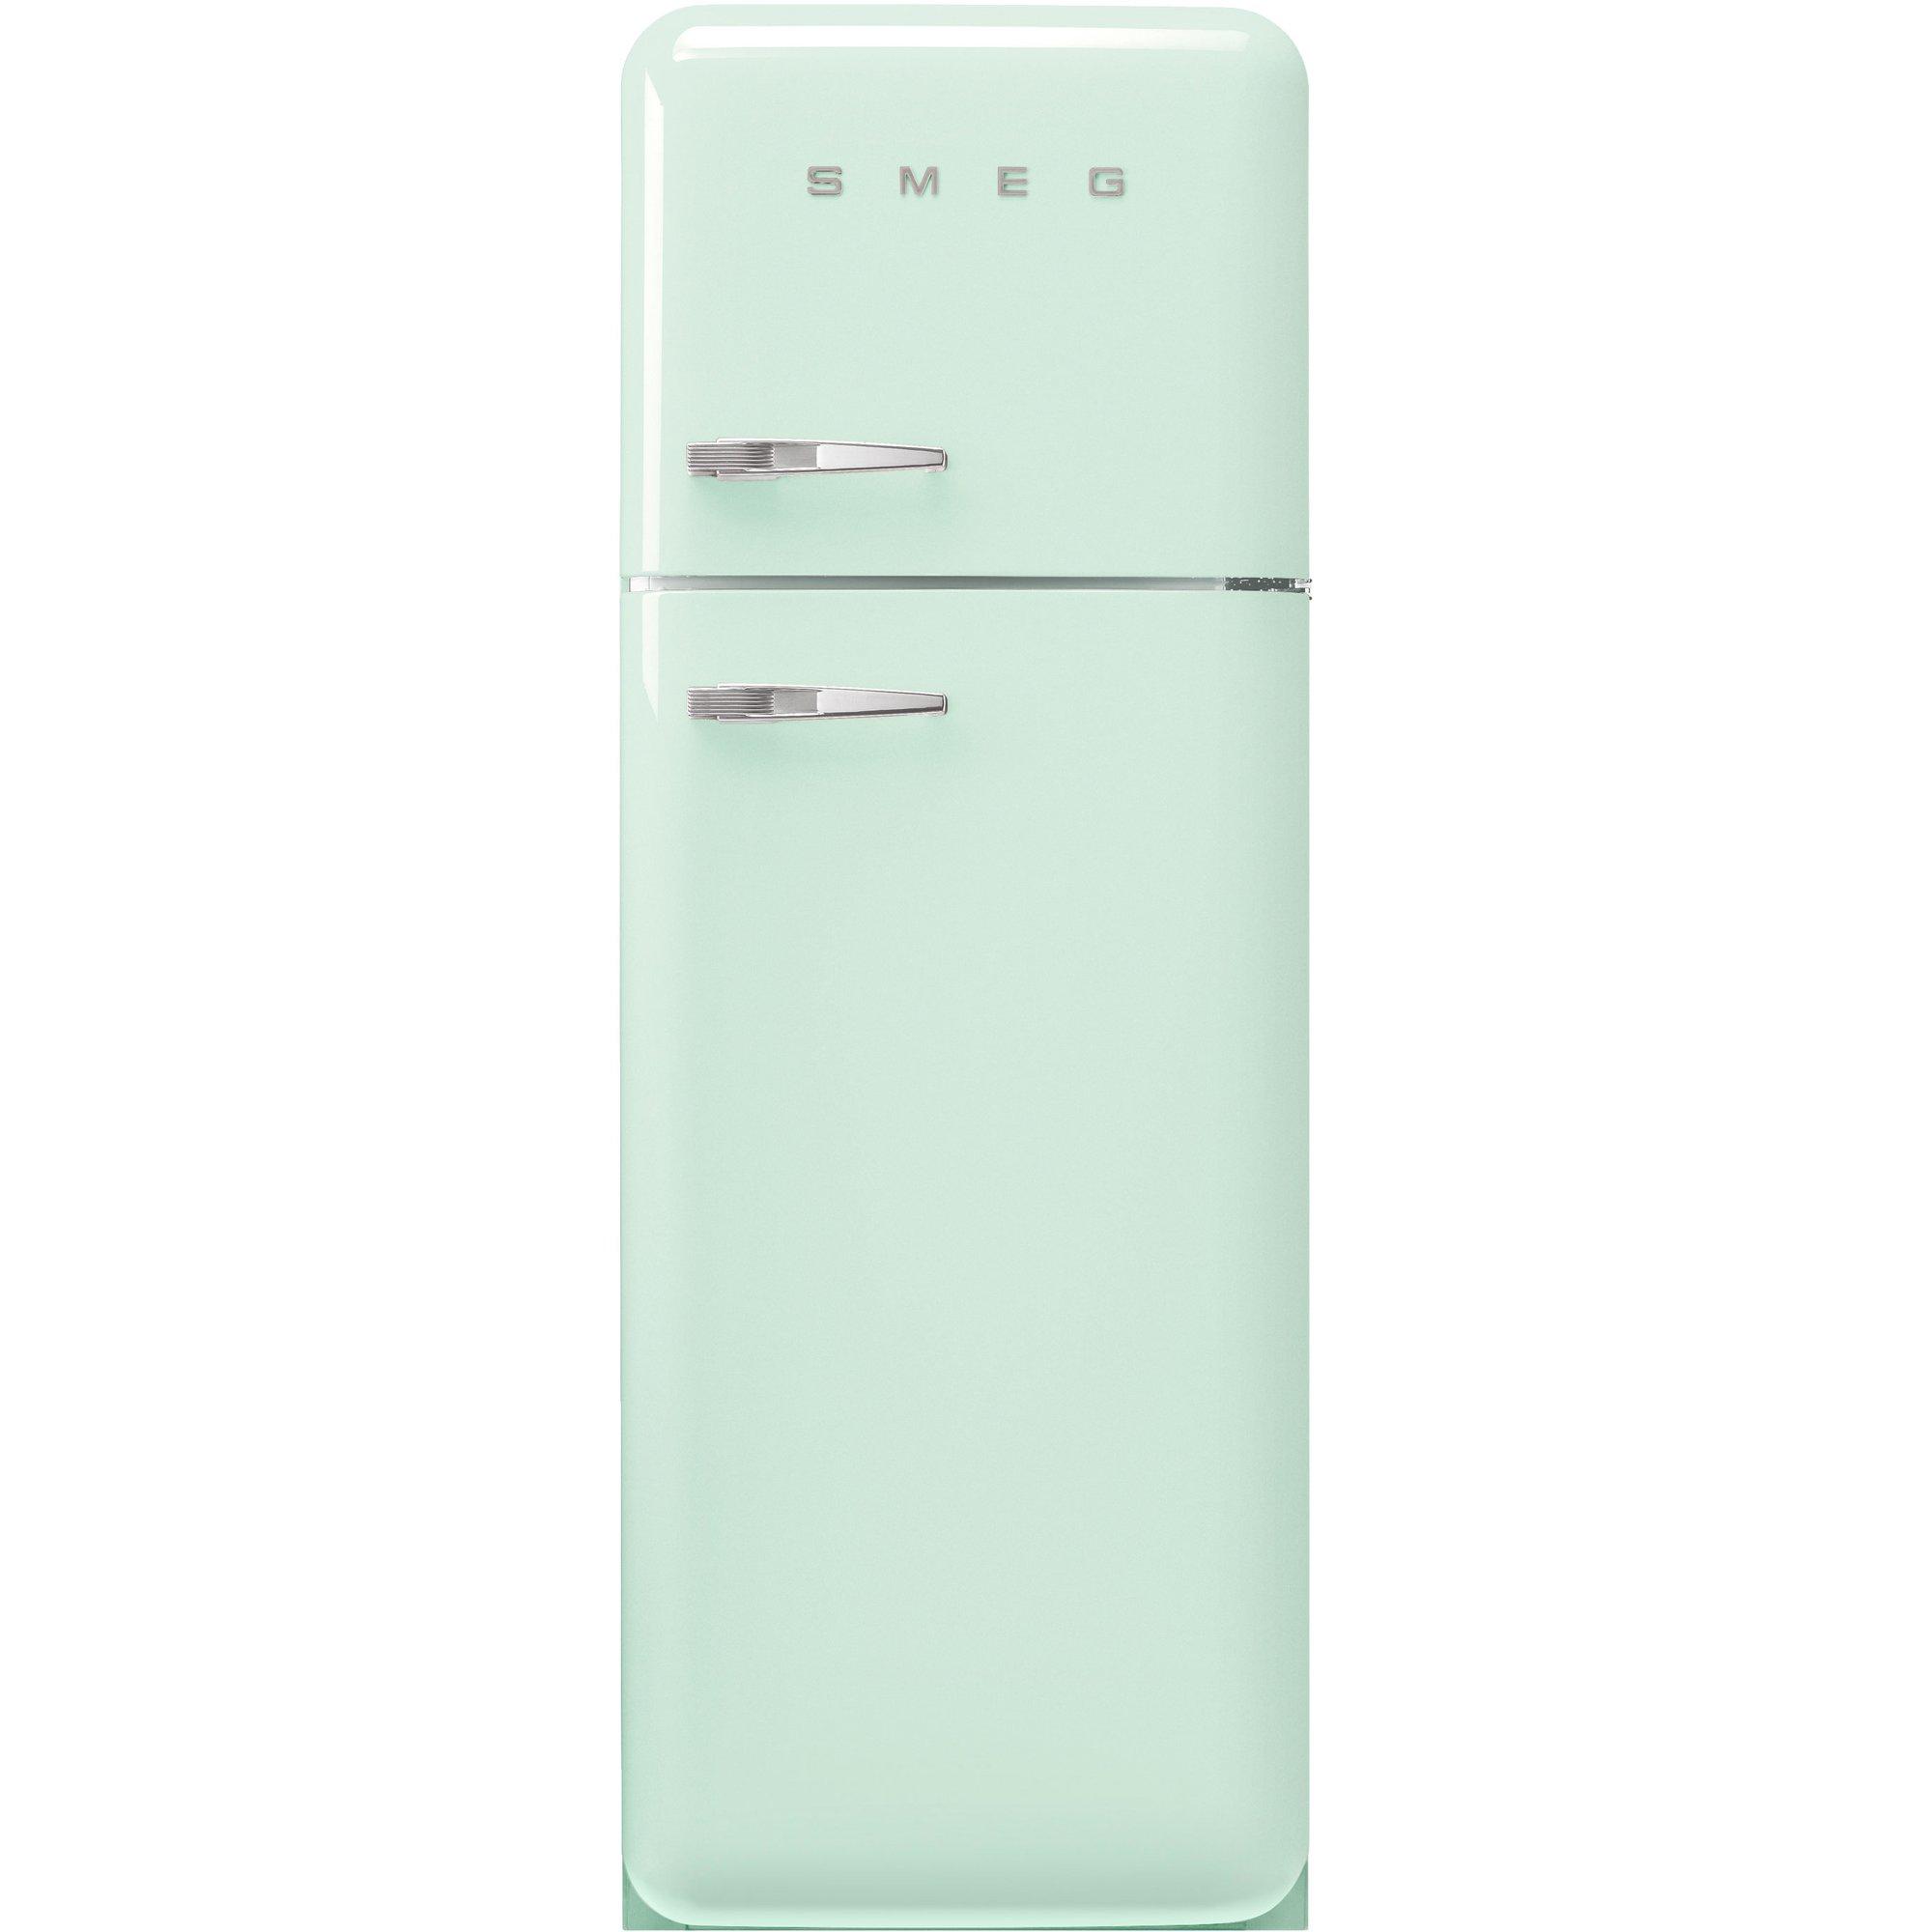 Smeg FAB30RPG5 Køle-/fryseskab pastelgrøn